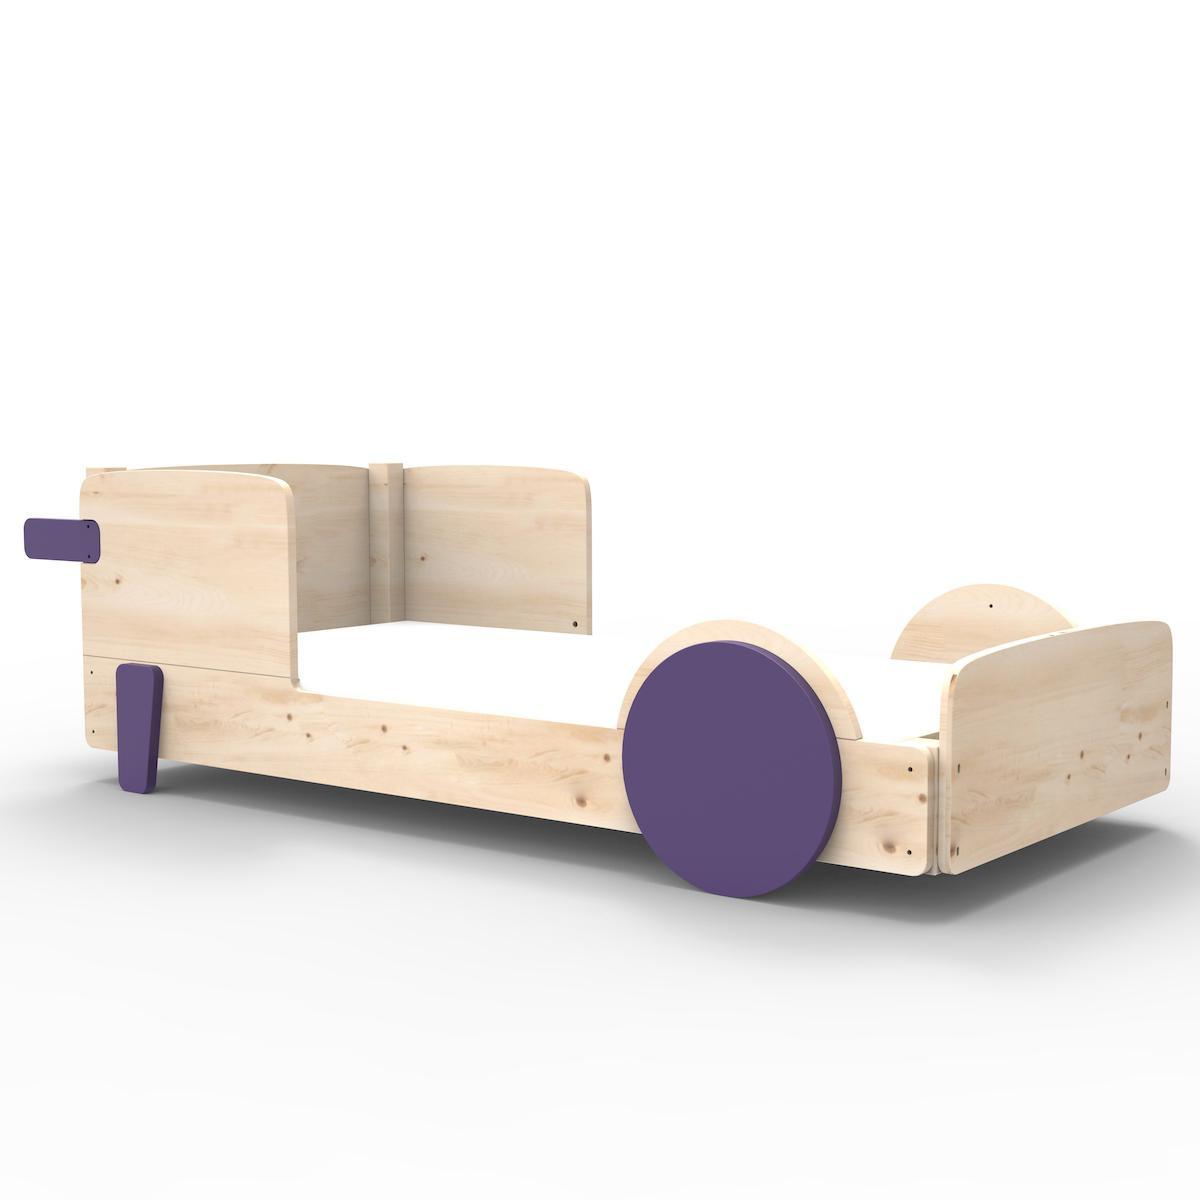 Lit bas 90x190cm DISCOVERY Mathy by Bols violet cuberdon